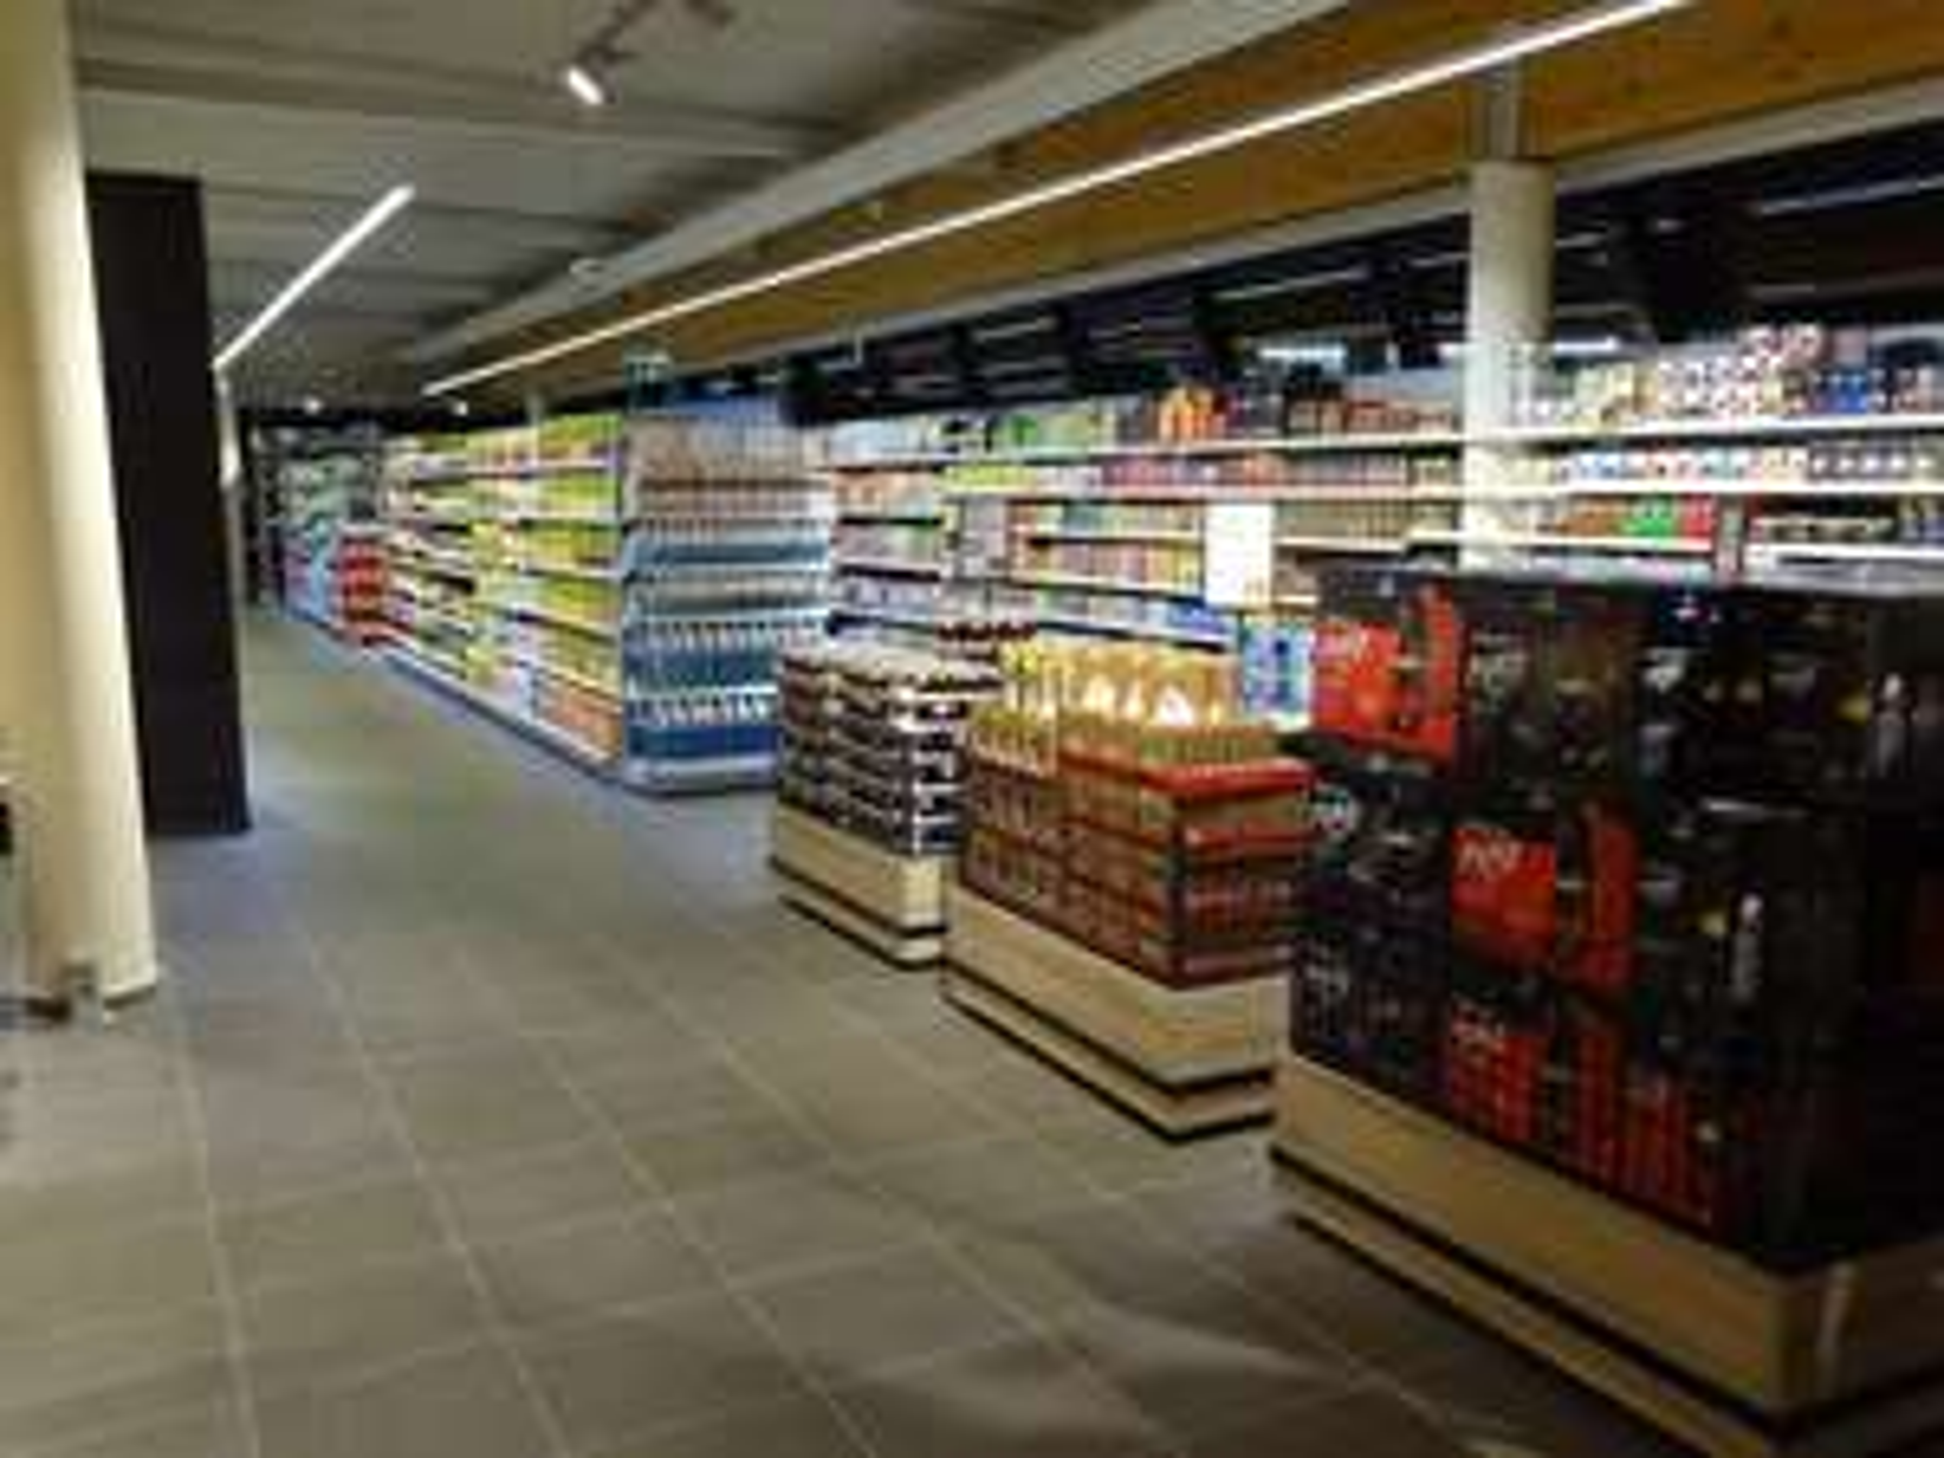 -50 % Abverkauf Spar (zukünftig Adeg) Piber in Möderbrugg